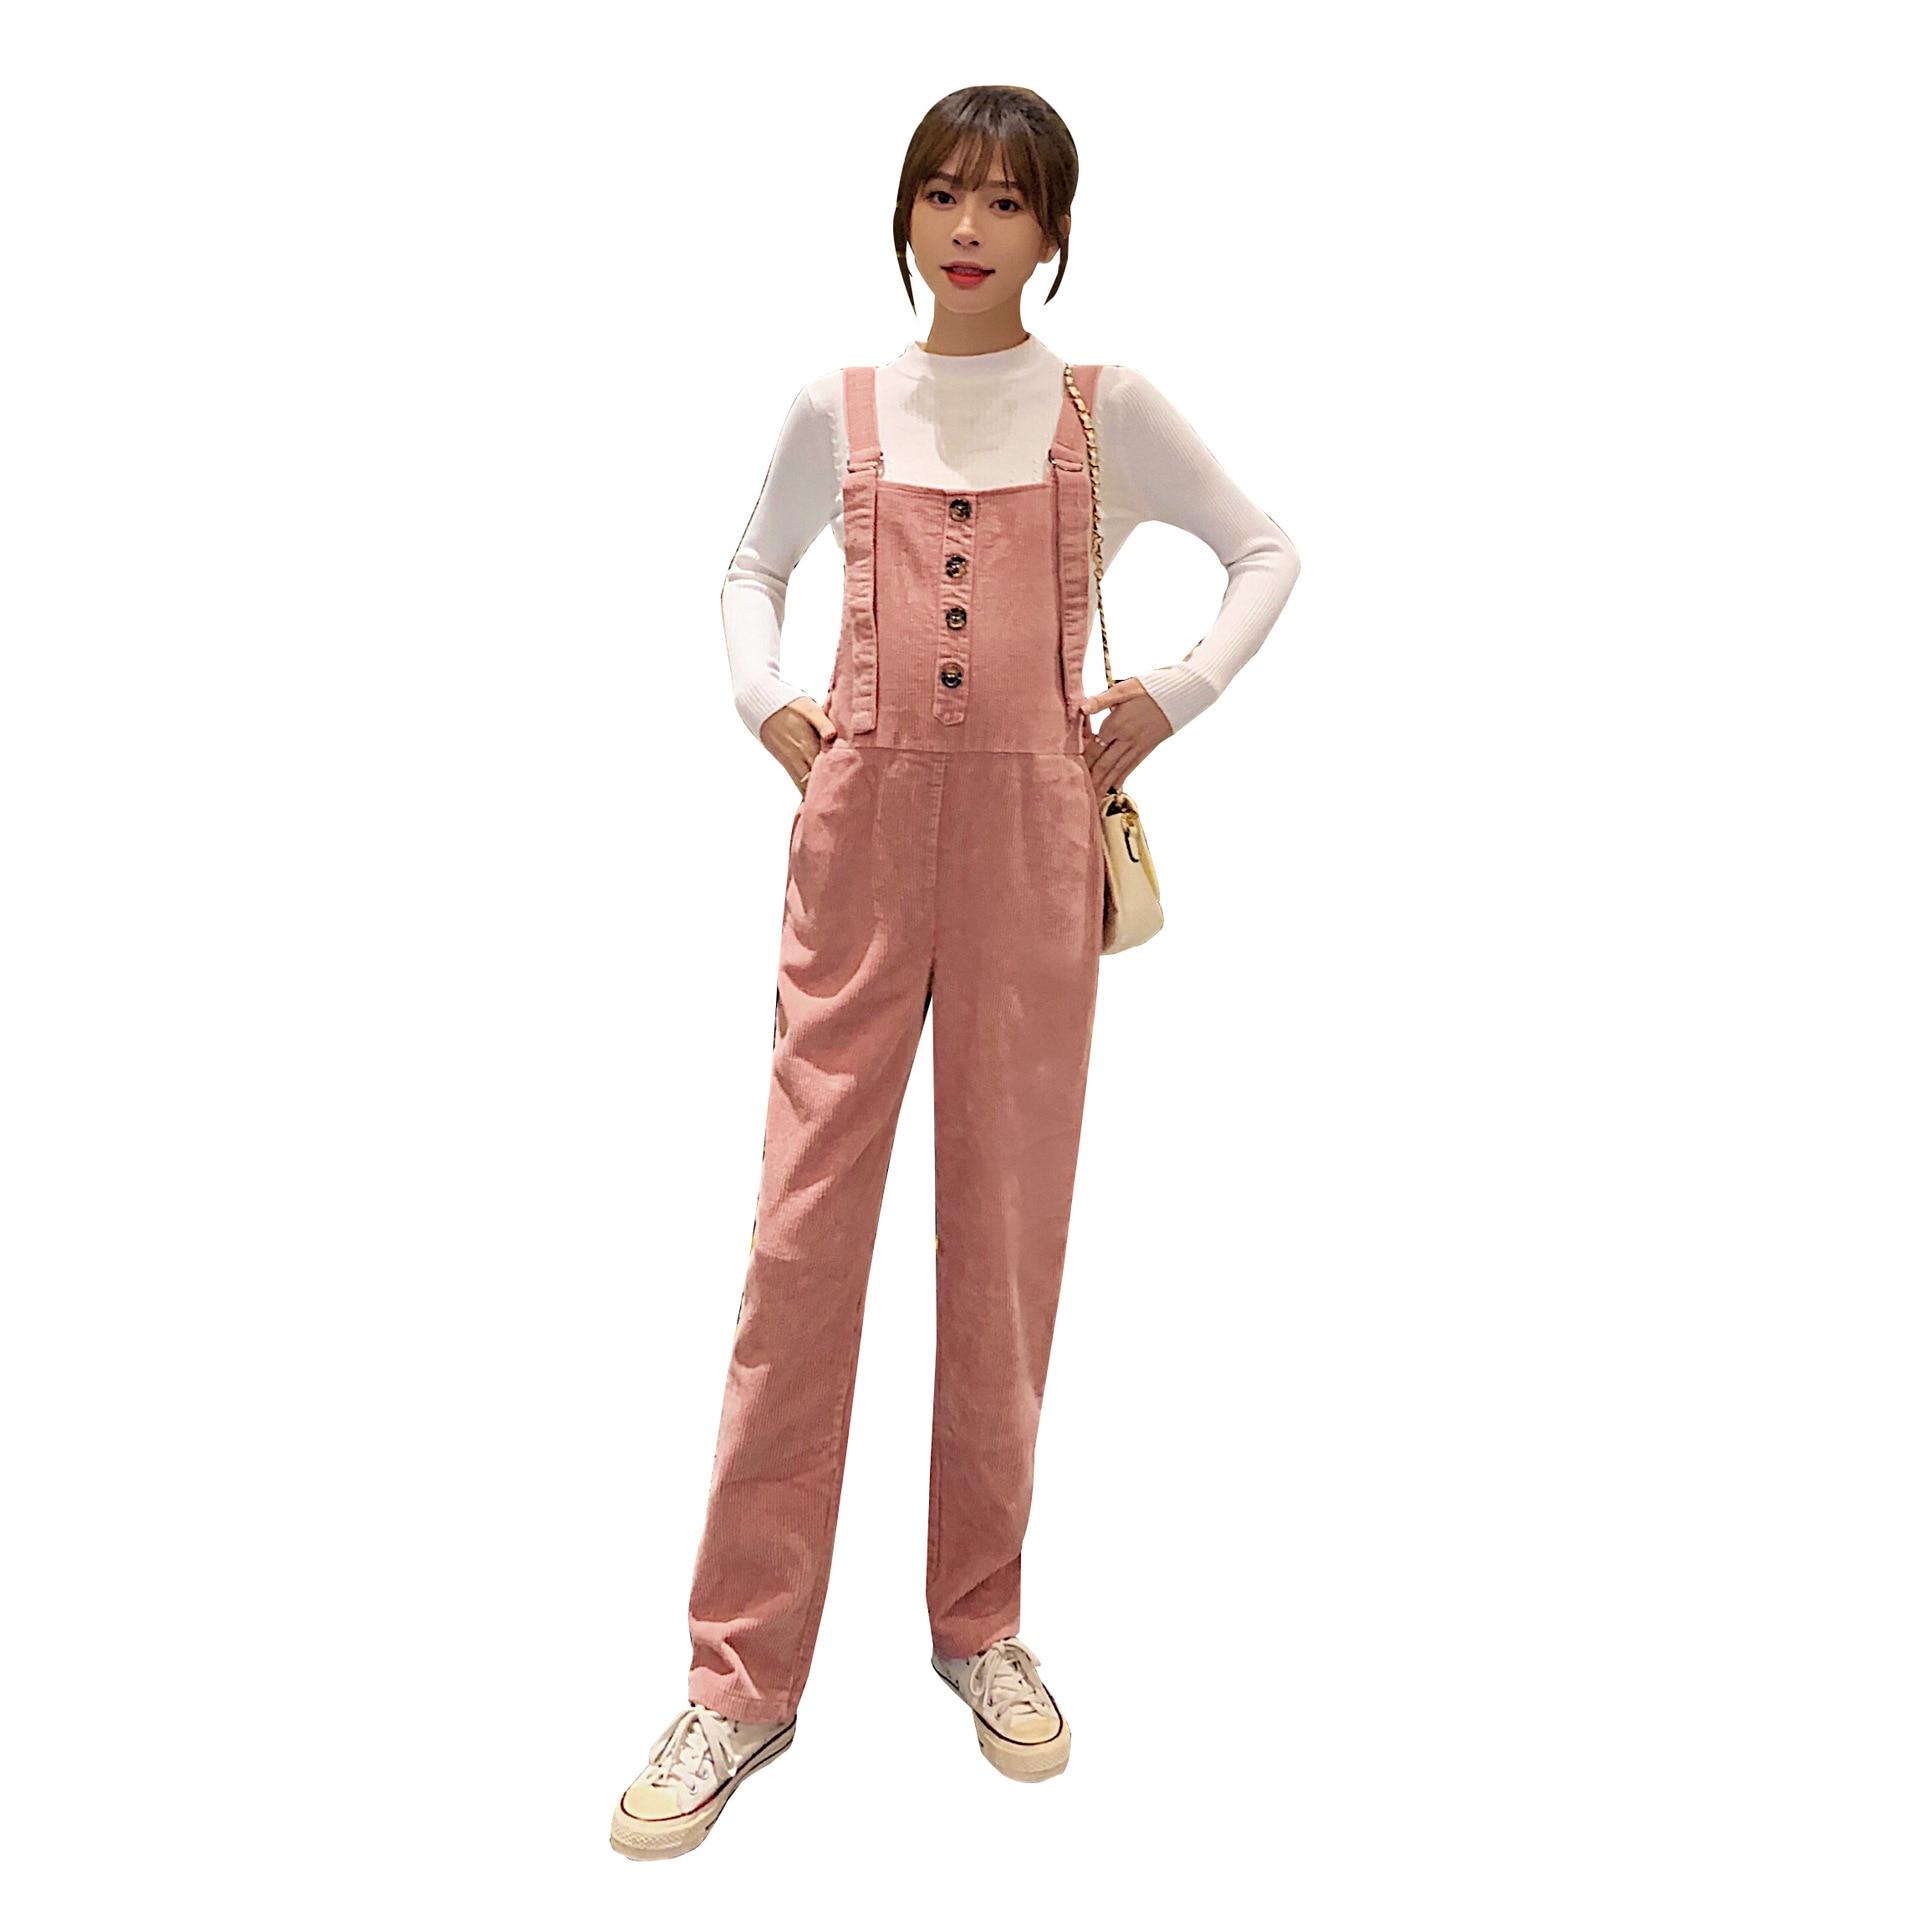 Autumn Winter Corduroy Maternity Bib Pants Fashion Casual Jumpsuits for Pregnant Women Adjustable Slim Pregnancy Overalls enlarge